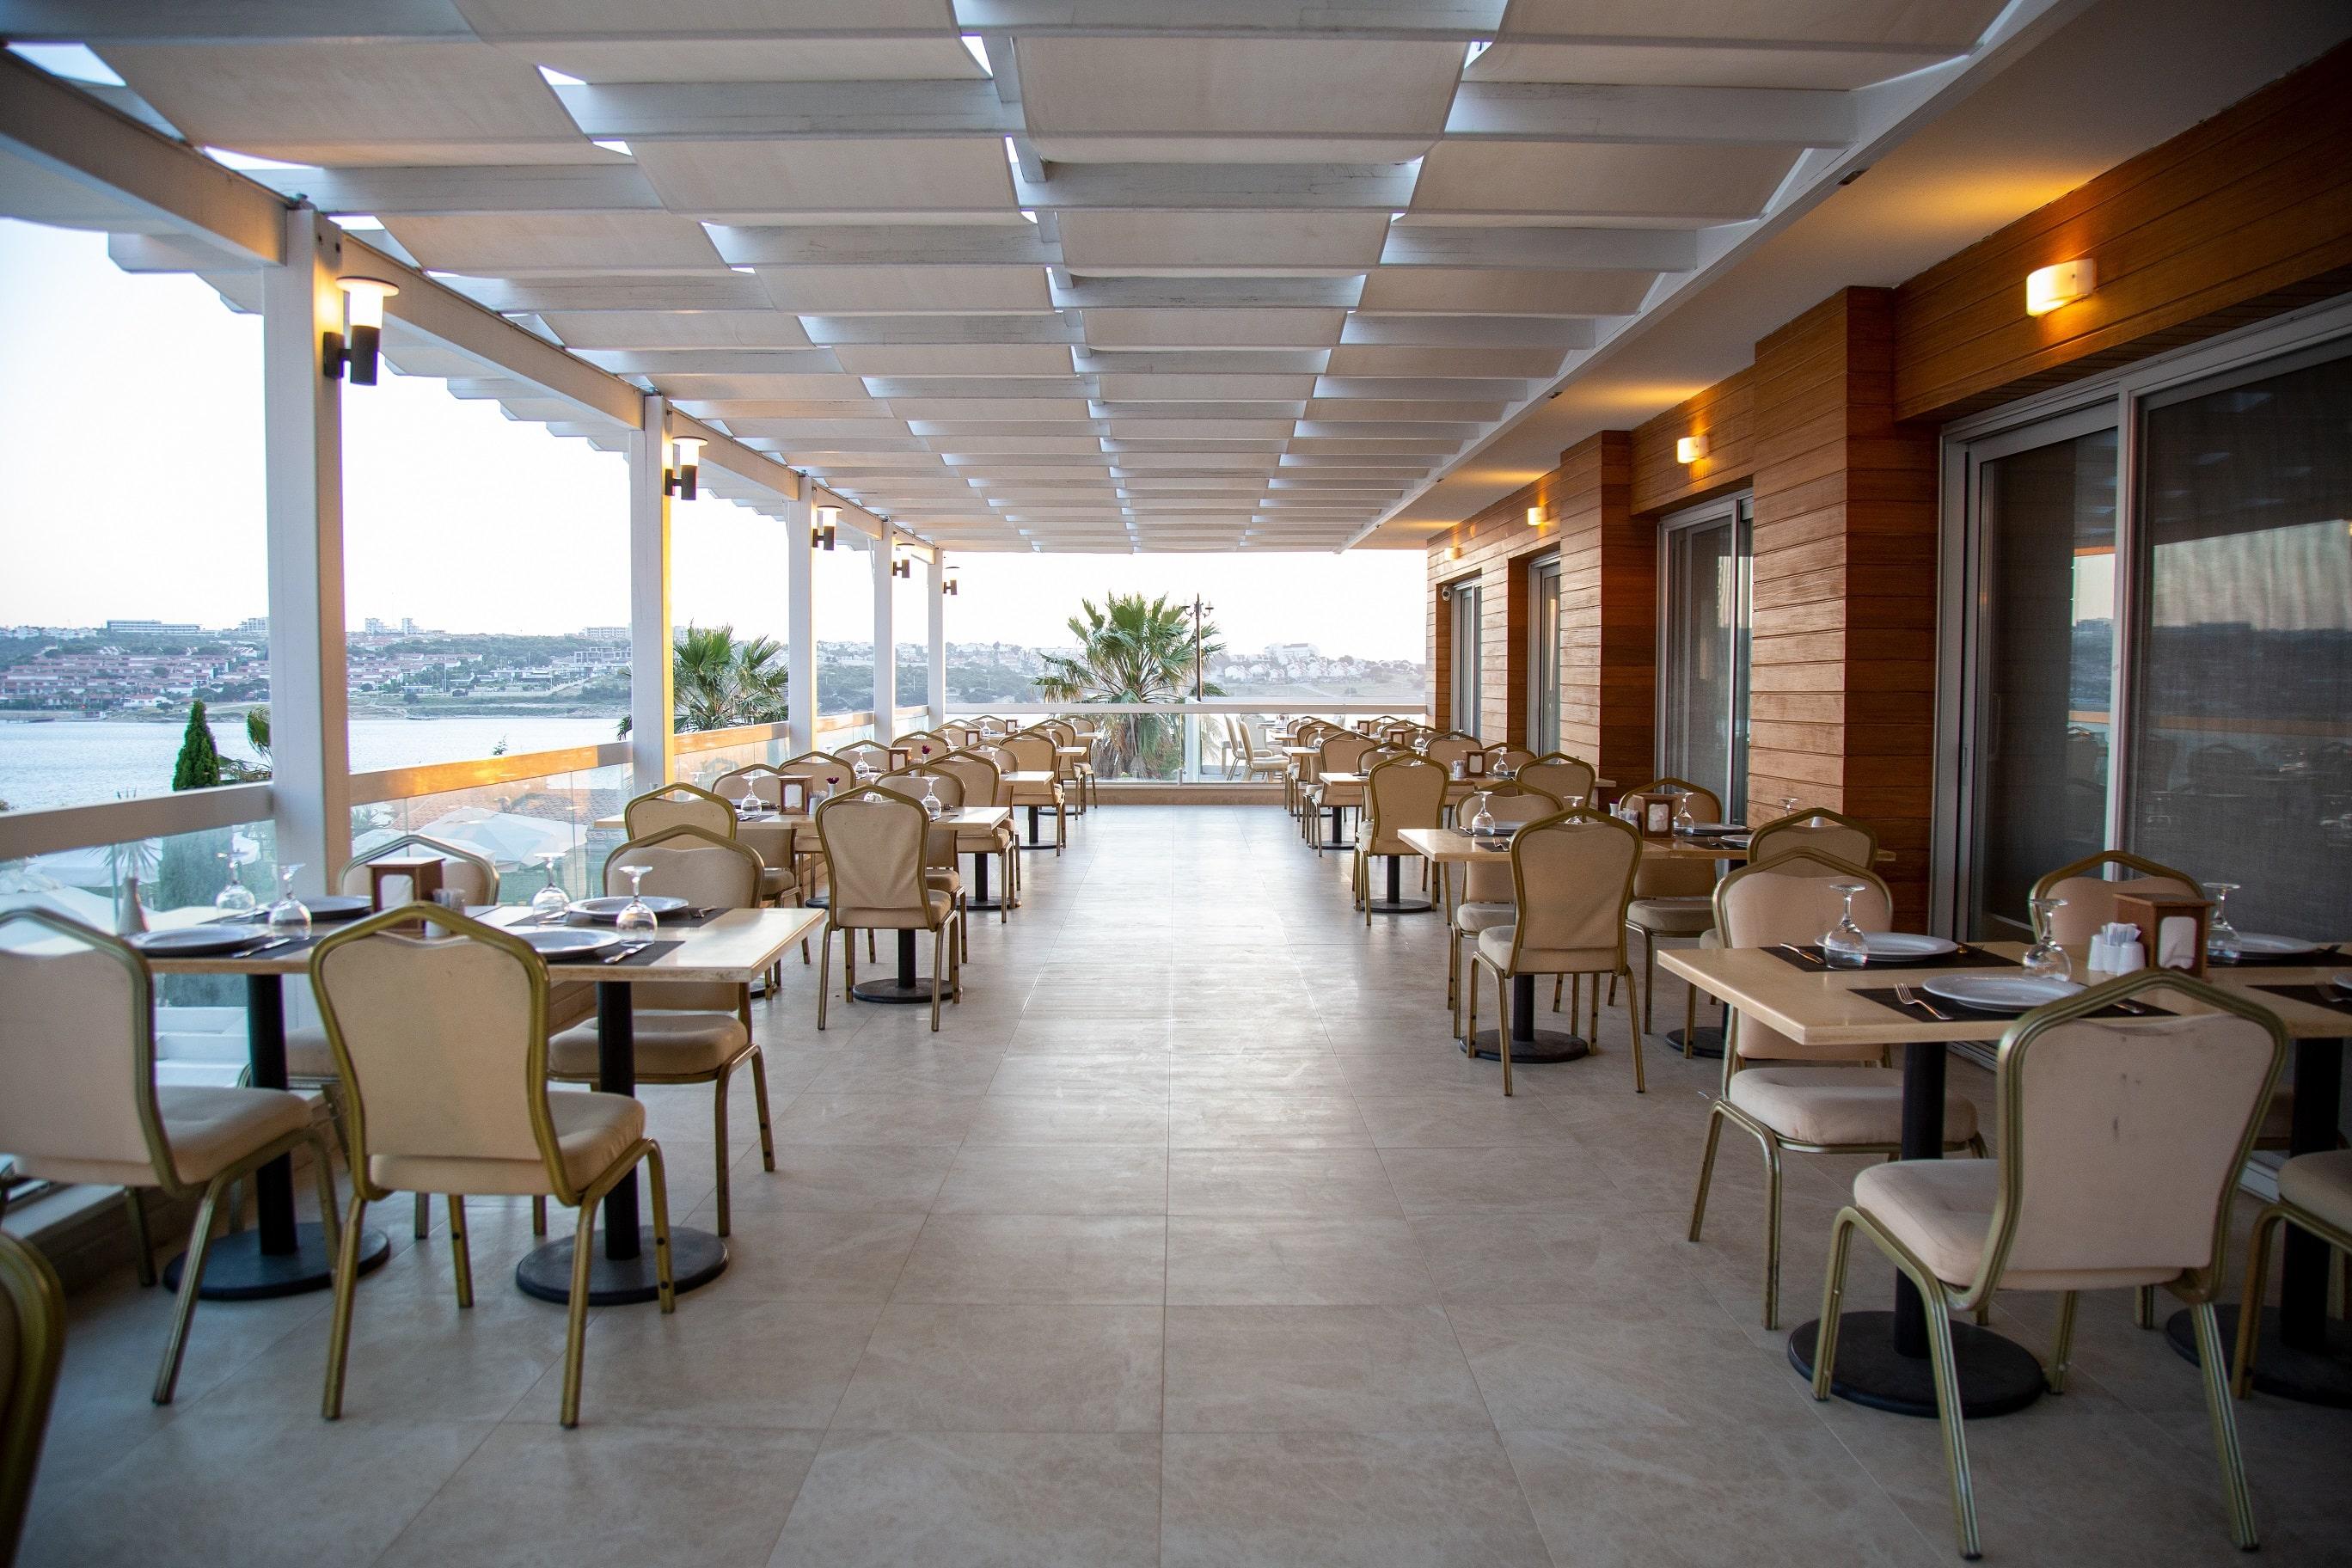 casa-de-playa-hotel-restoran-2